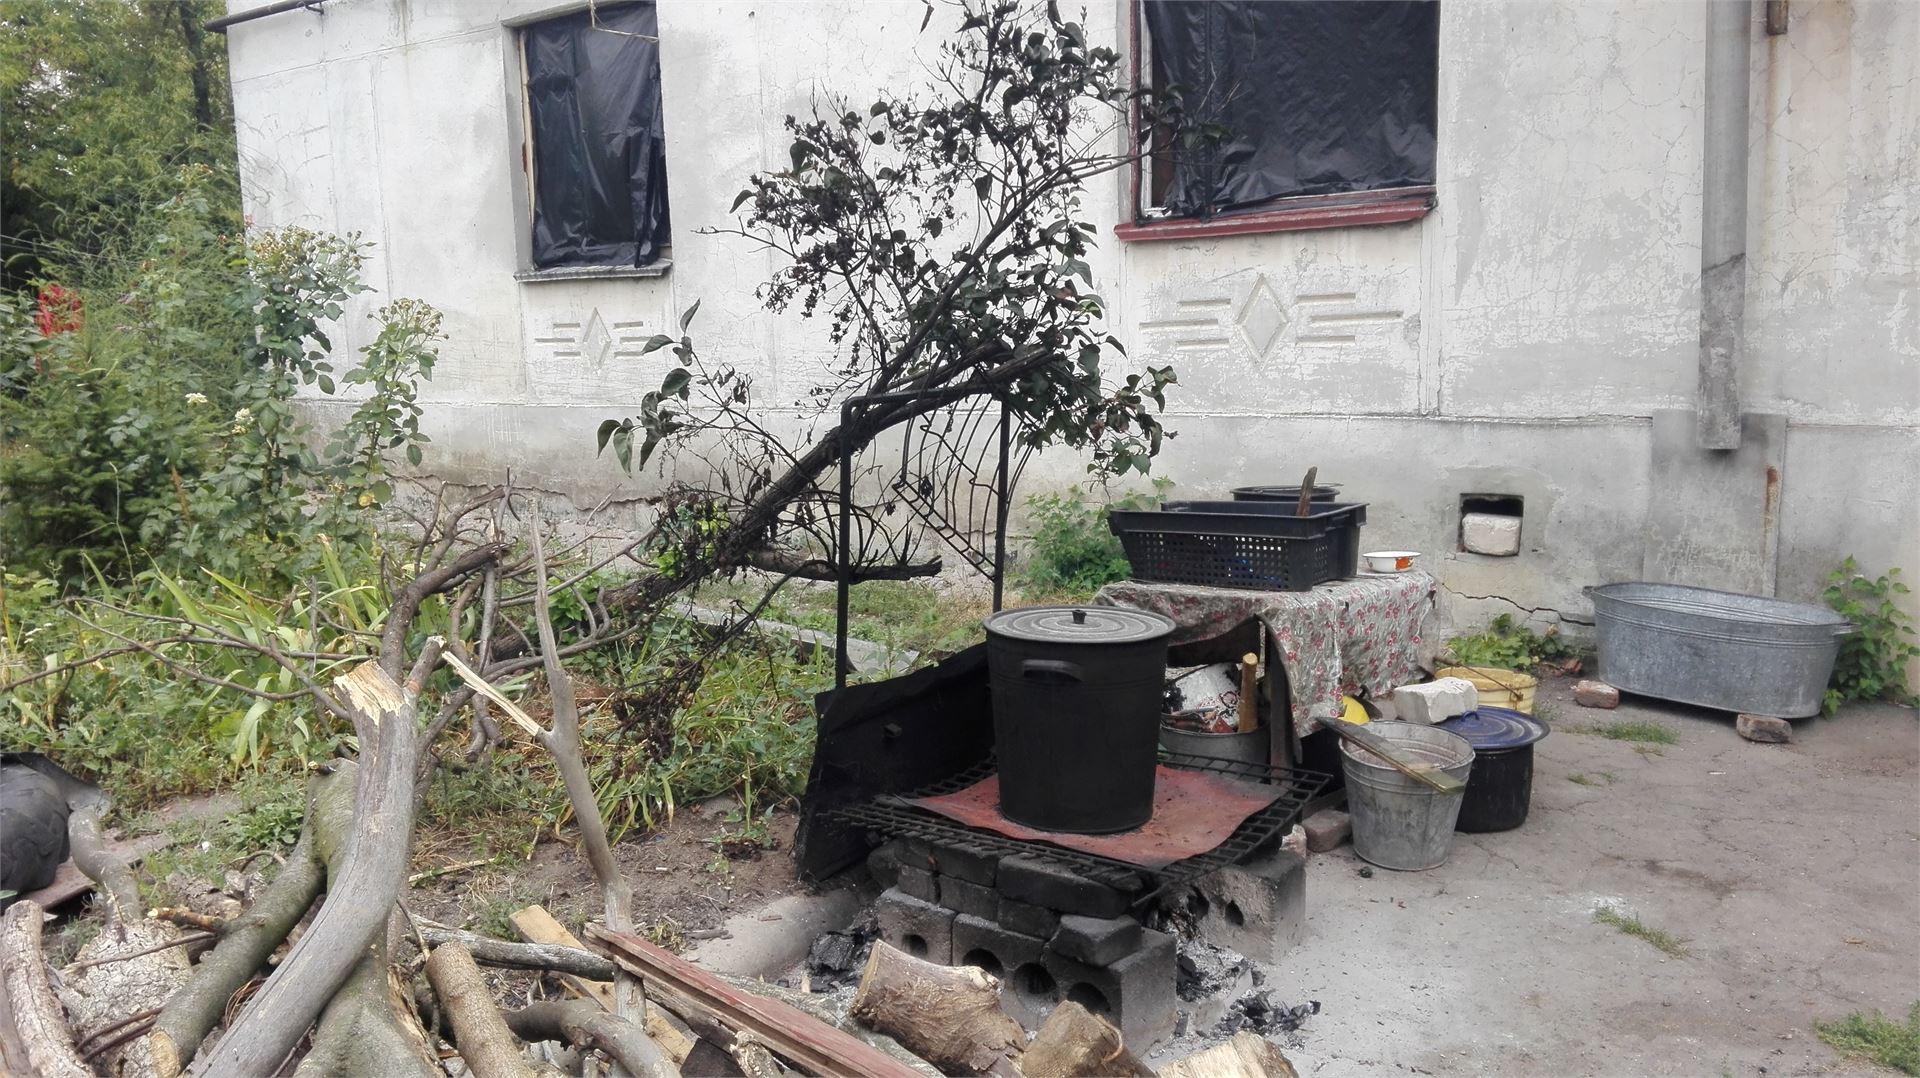 Кухня во дворе дома. Газа нет.